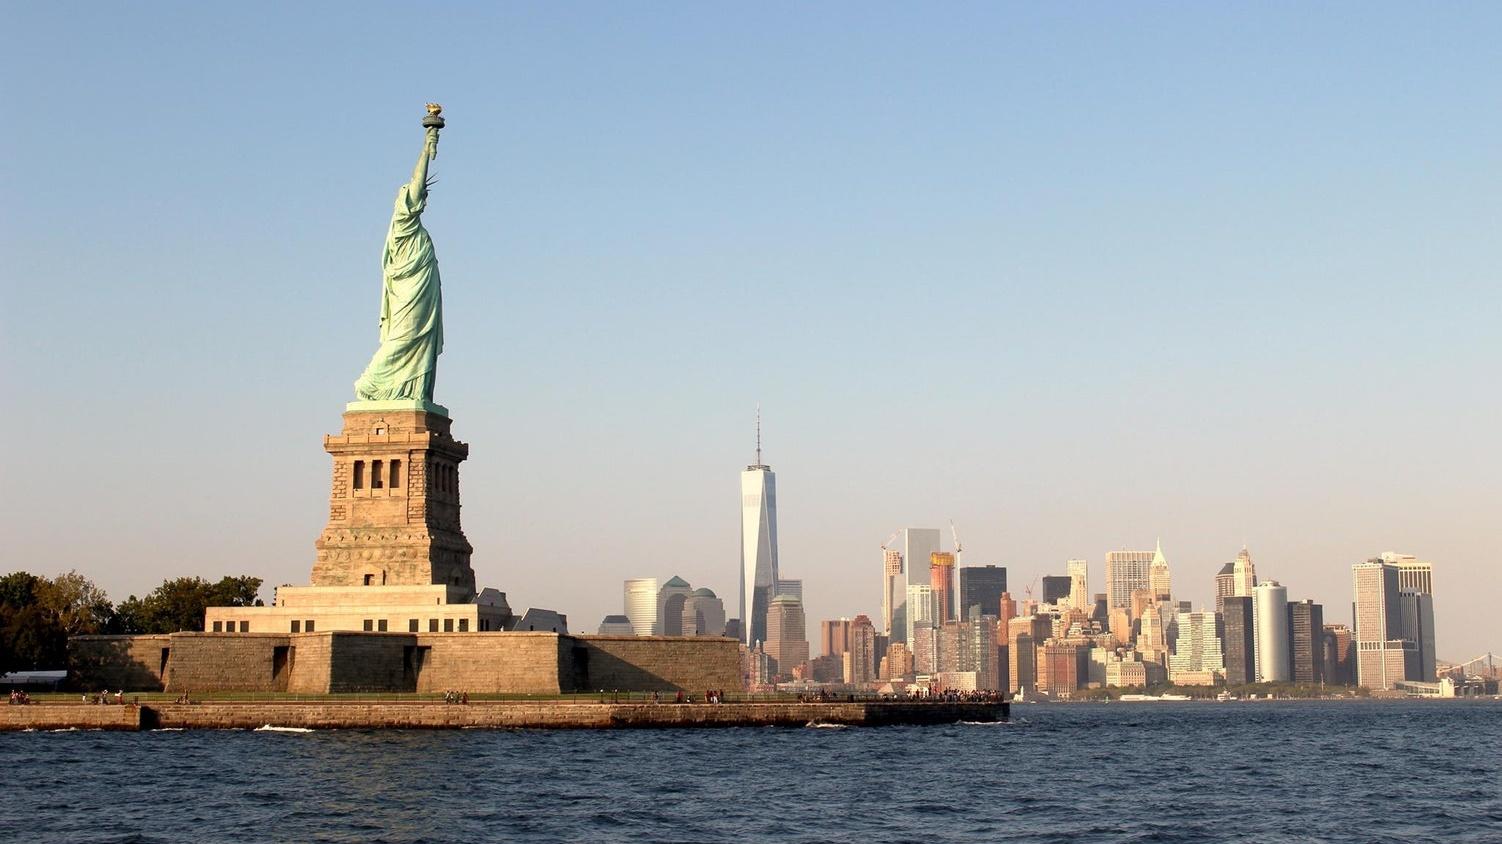 Statue of Liberty & NYC skyline